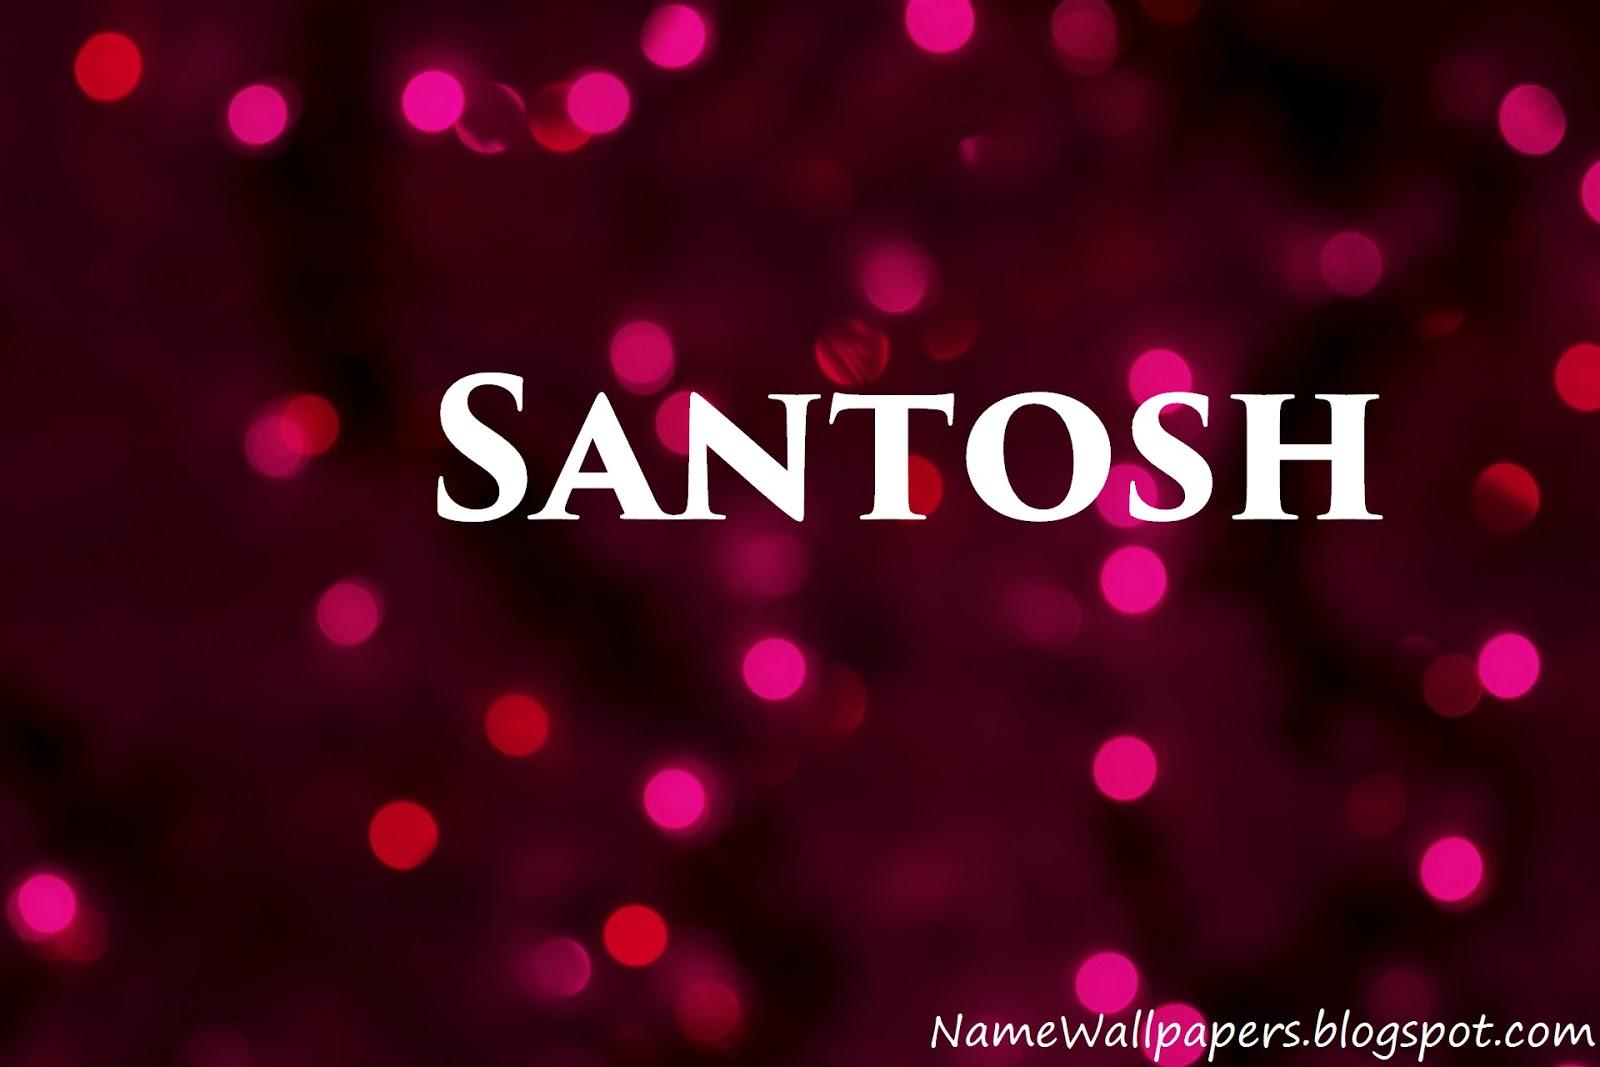 Pittsburgh Steelers Iphone Wallpaper Download Santosh Name Wallpaper Download Gallery